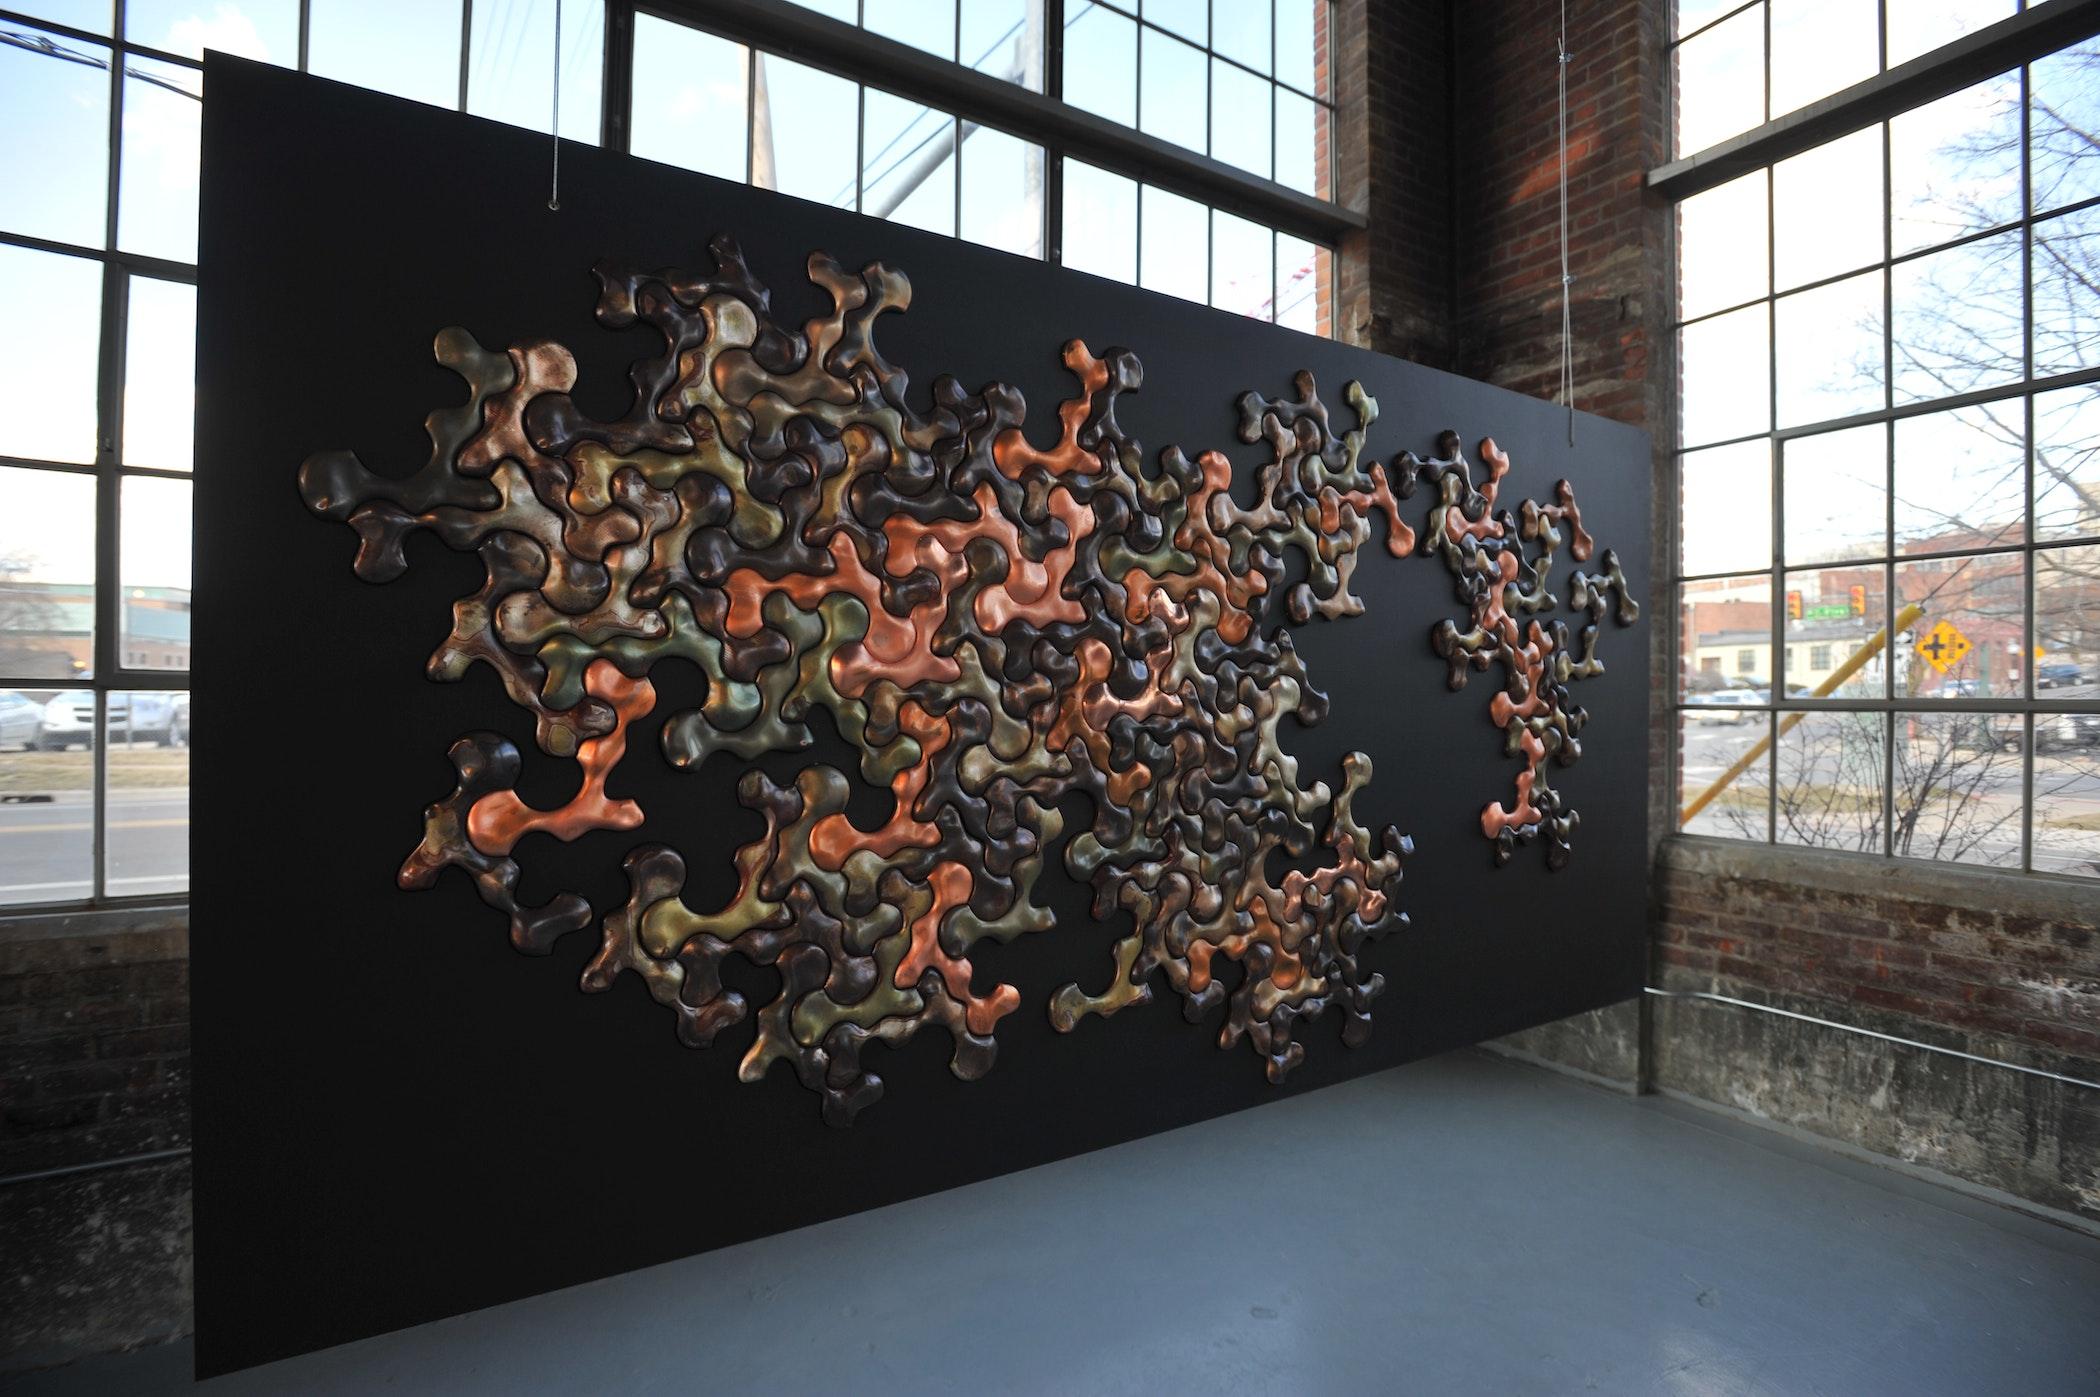 Electroform(alism) exhibit at Liberty Annex, Ann Arbor, MI 2014